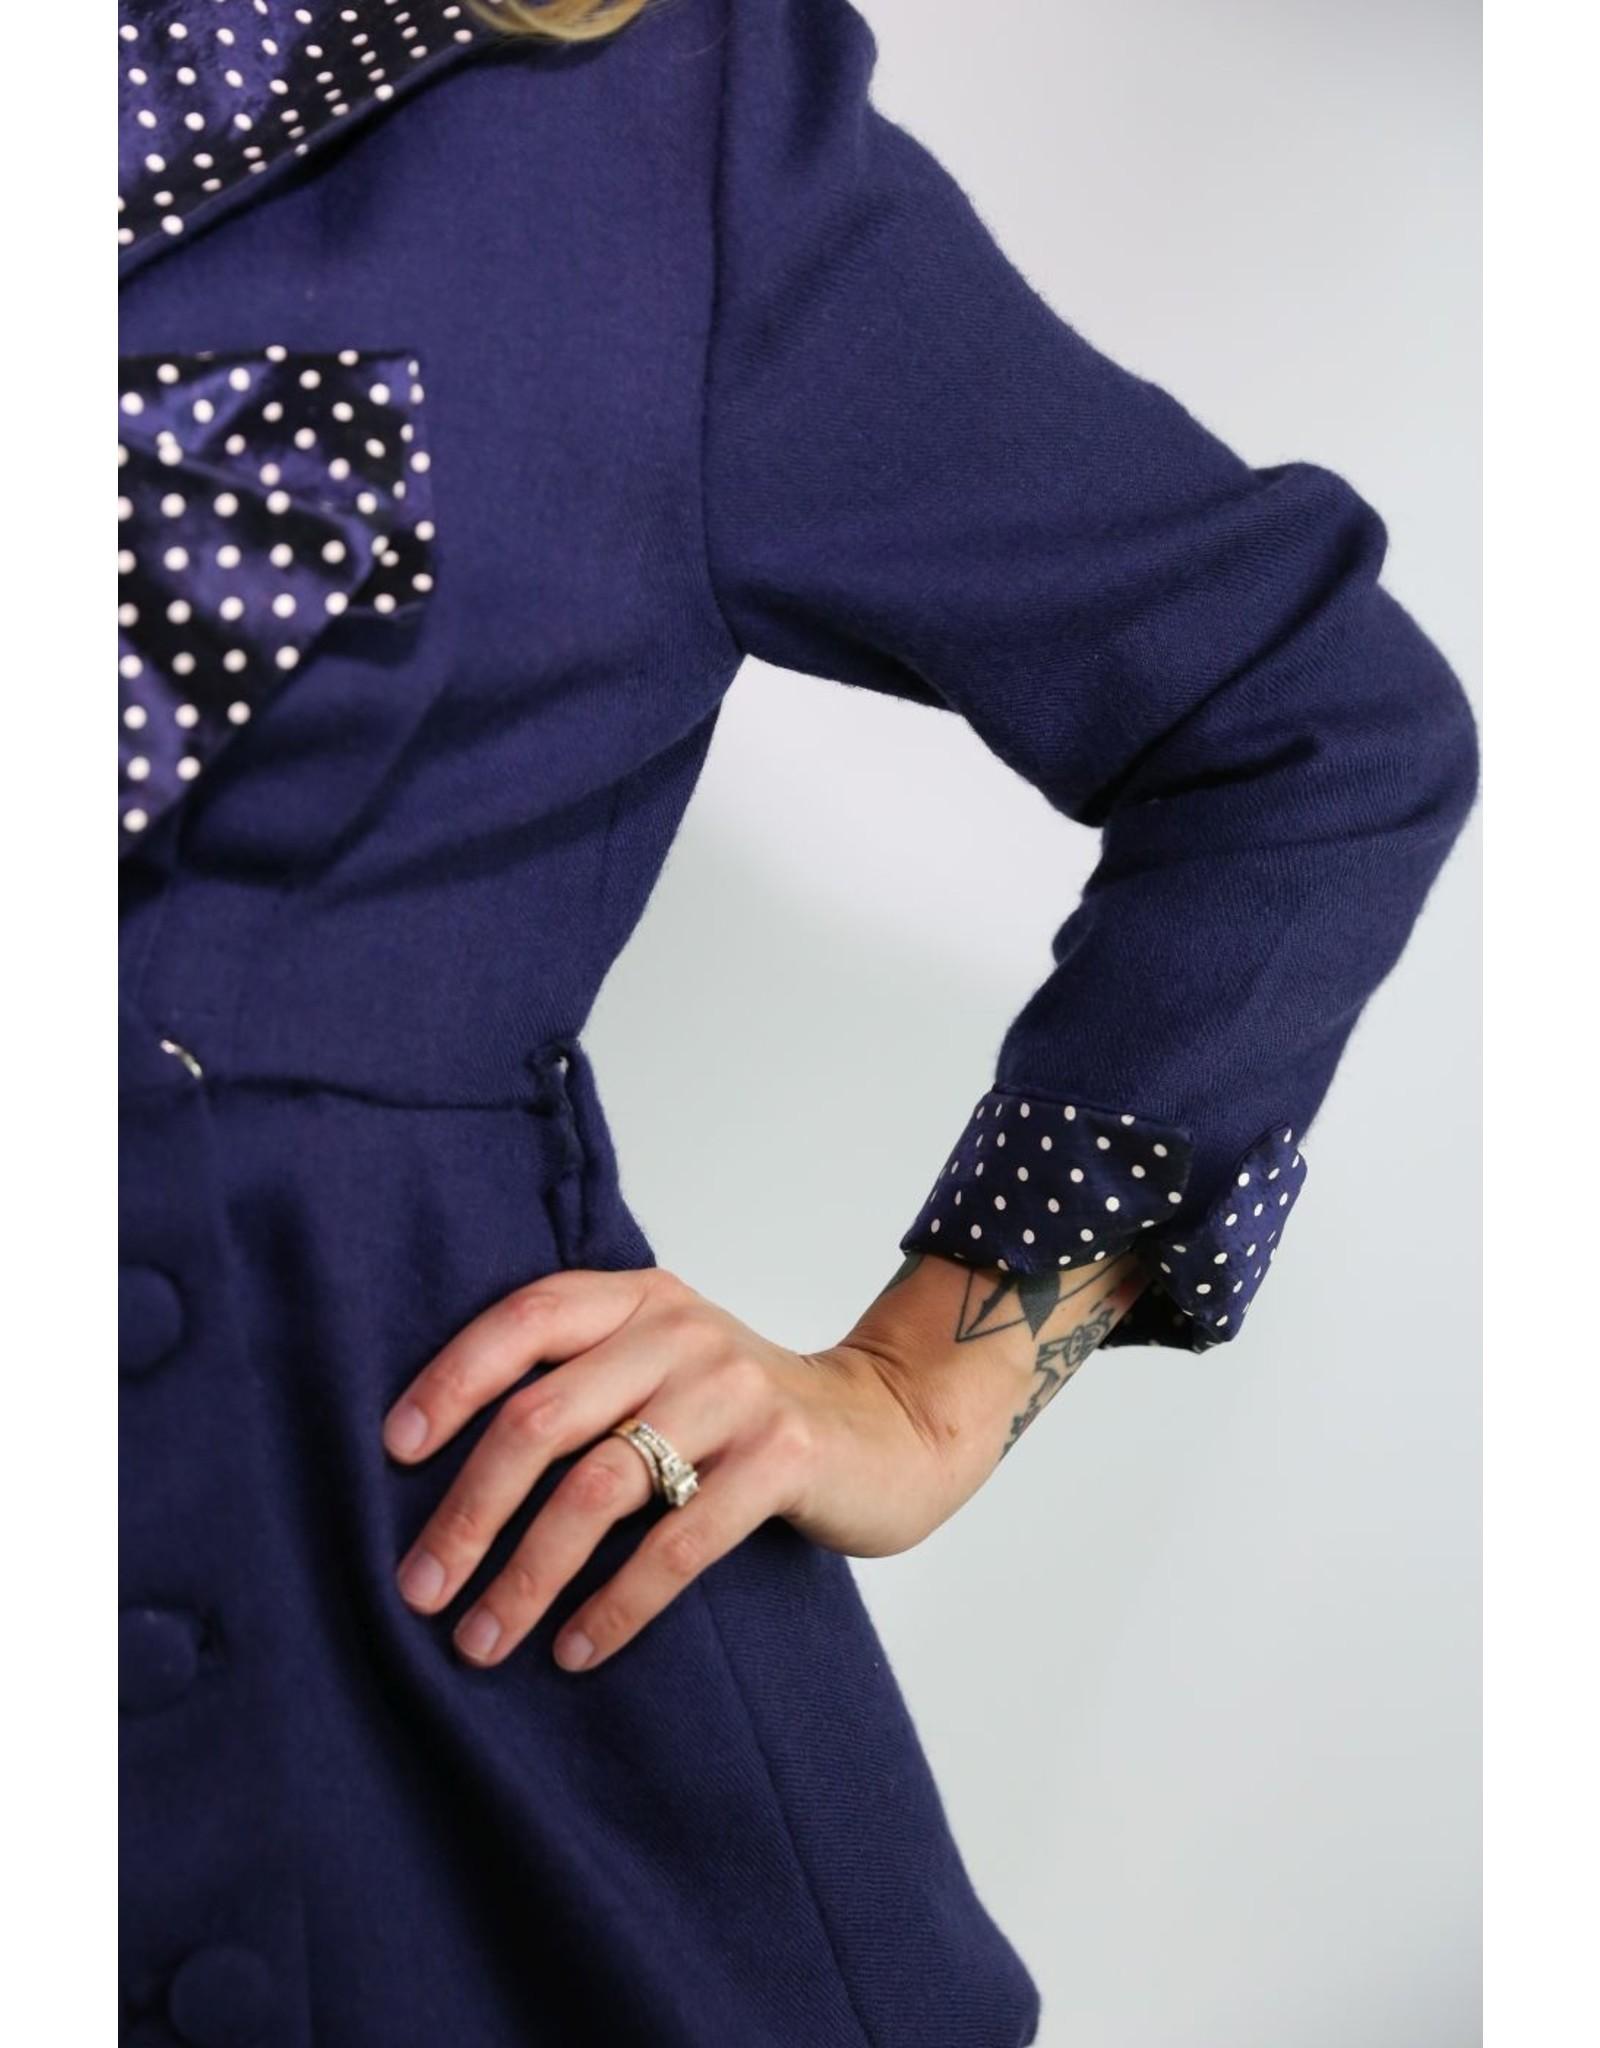 1950's Blue Jacket w/ Polka Dot Collar